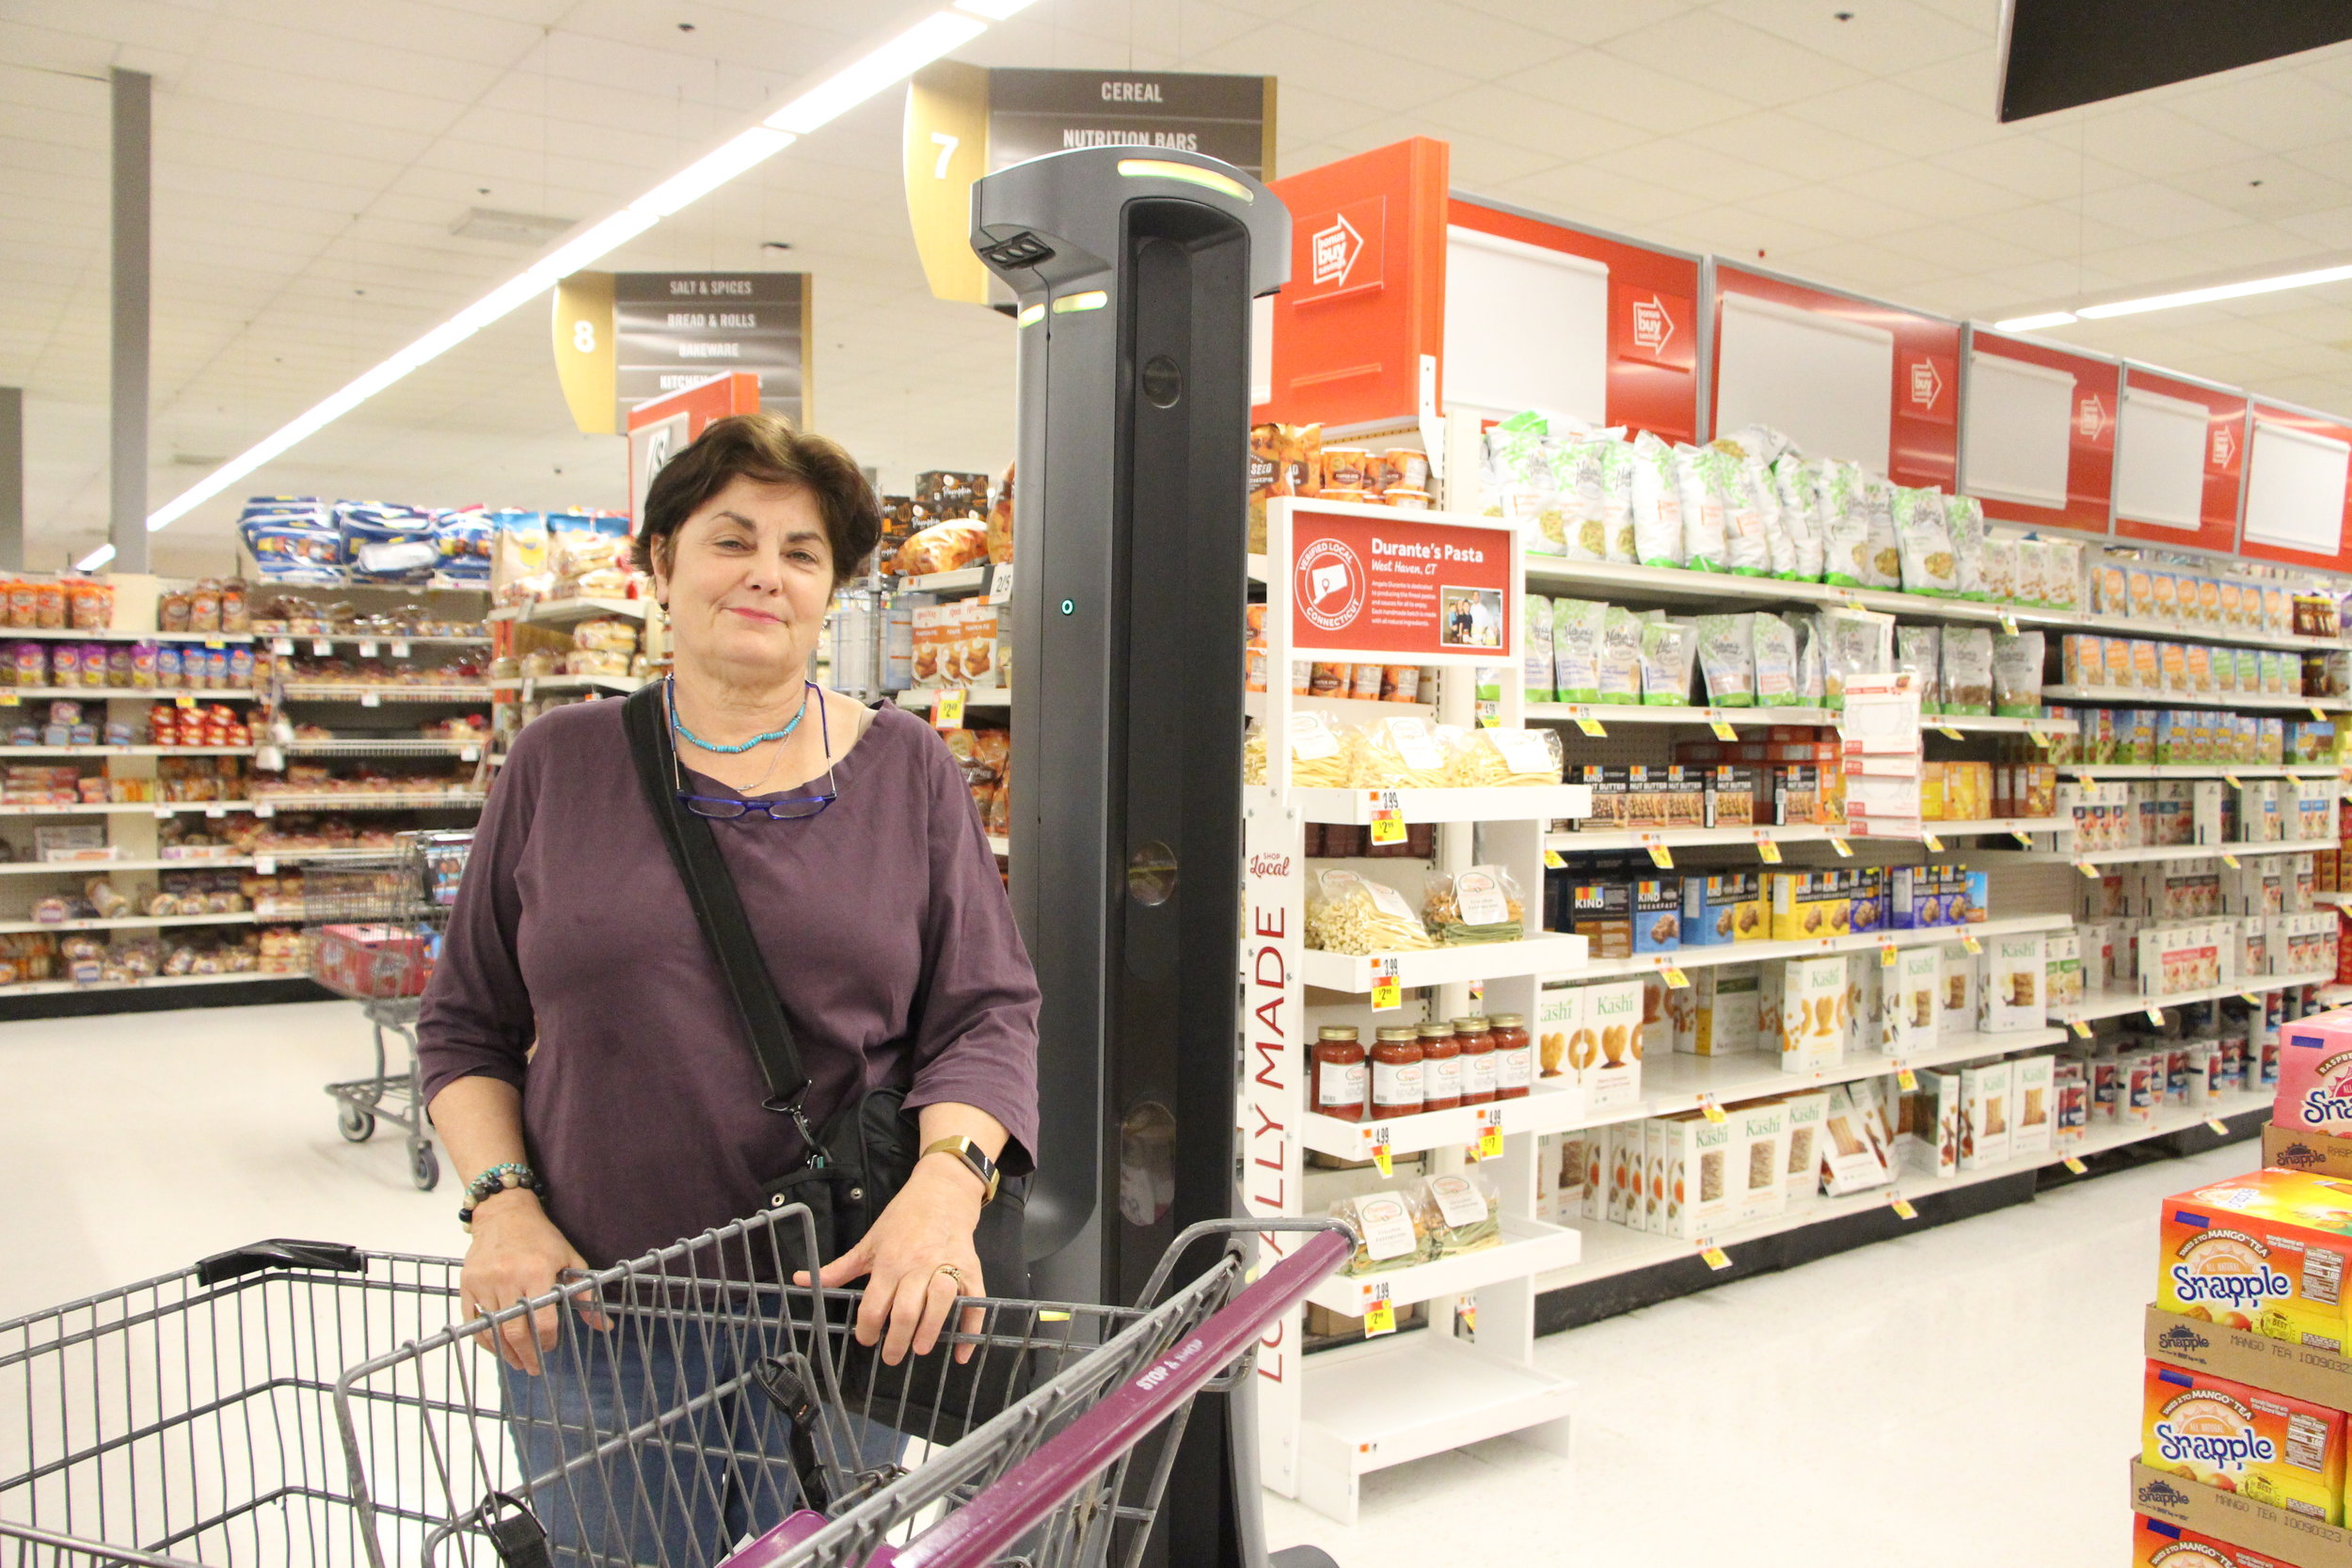 Stop & Shop customer, Karen Swanson, shopping alongside Marty.